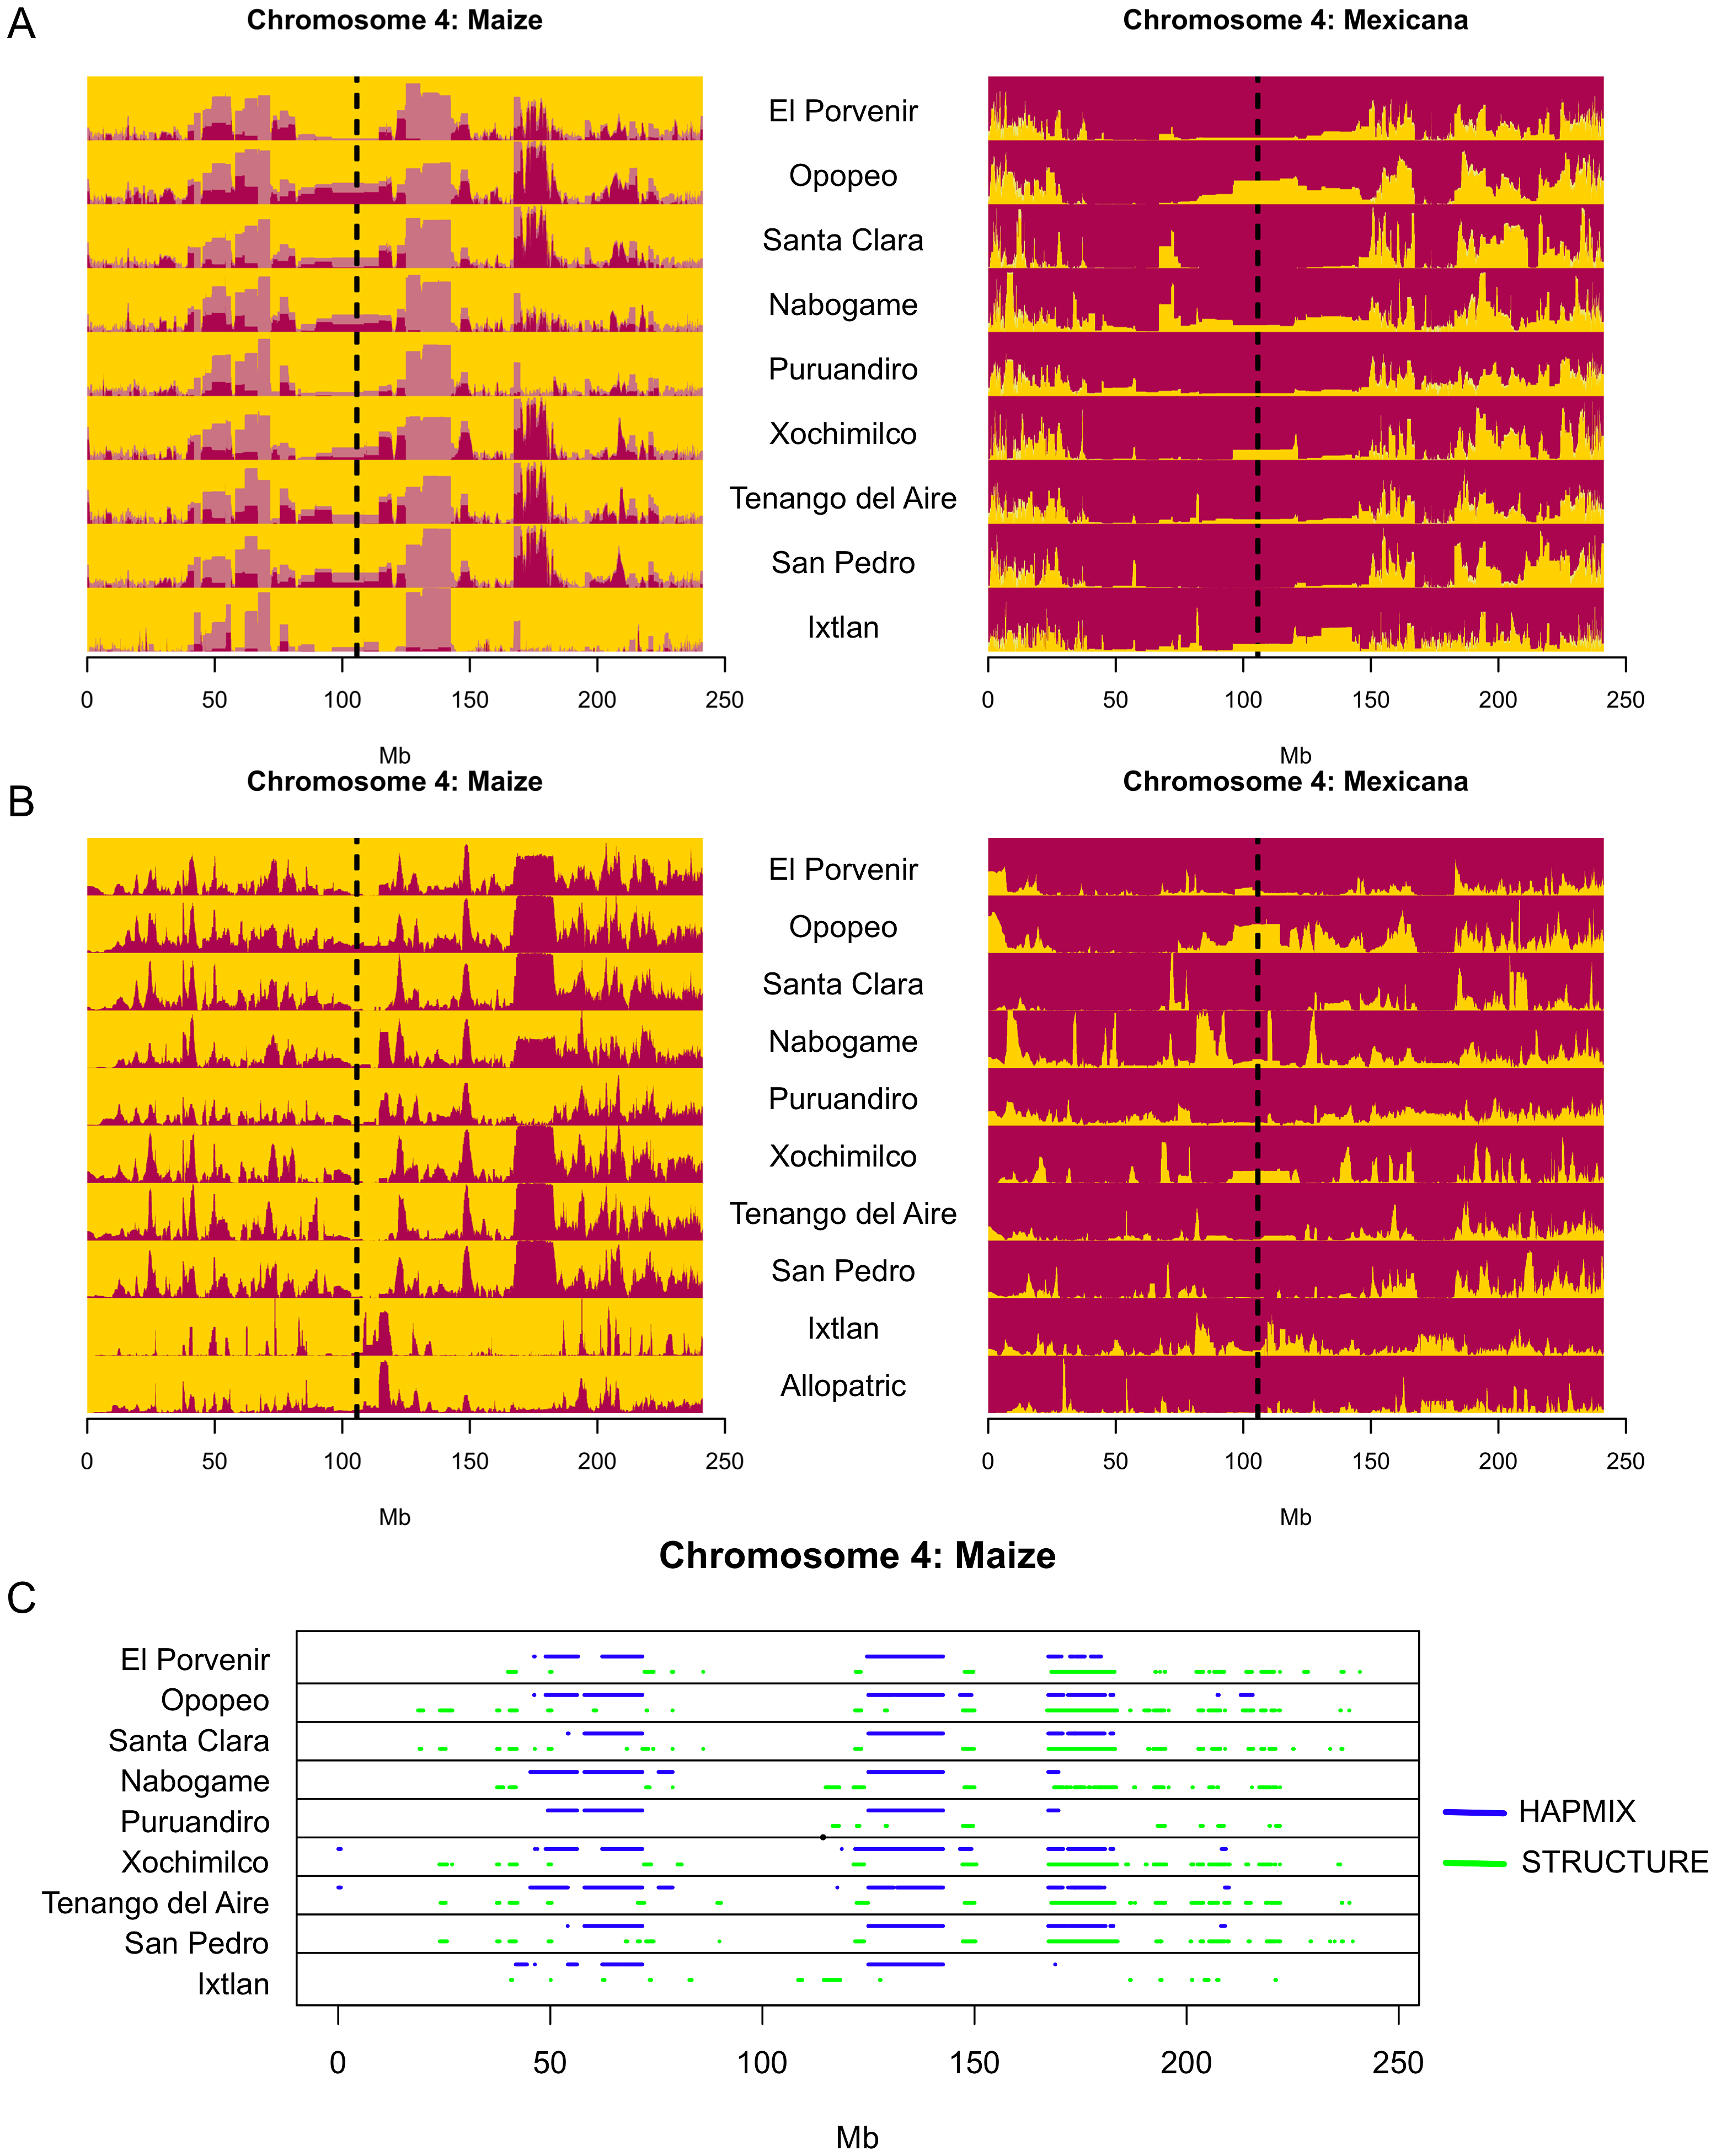 Detection of introgression across chromosome 4.